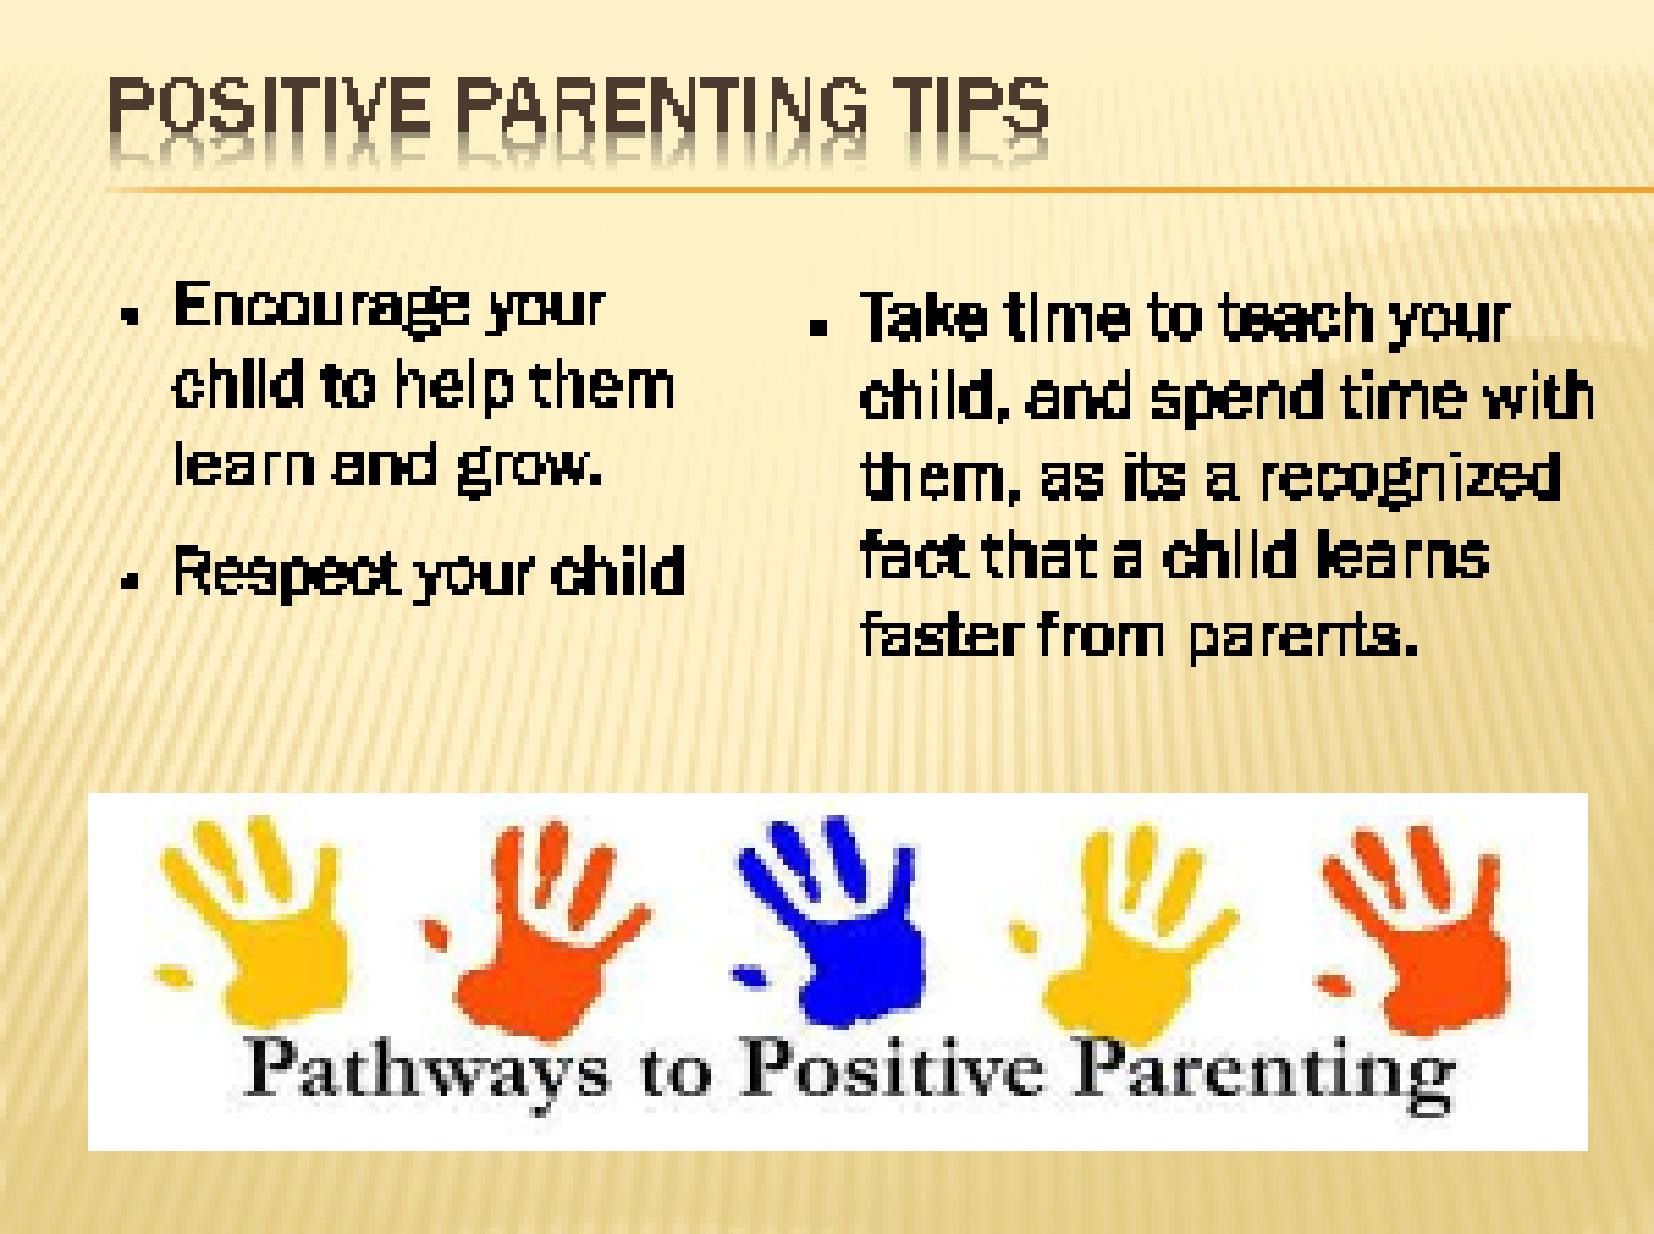 ECE 355 Week 5 Final Project Parenting Presentation